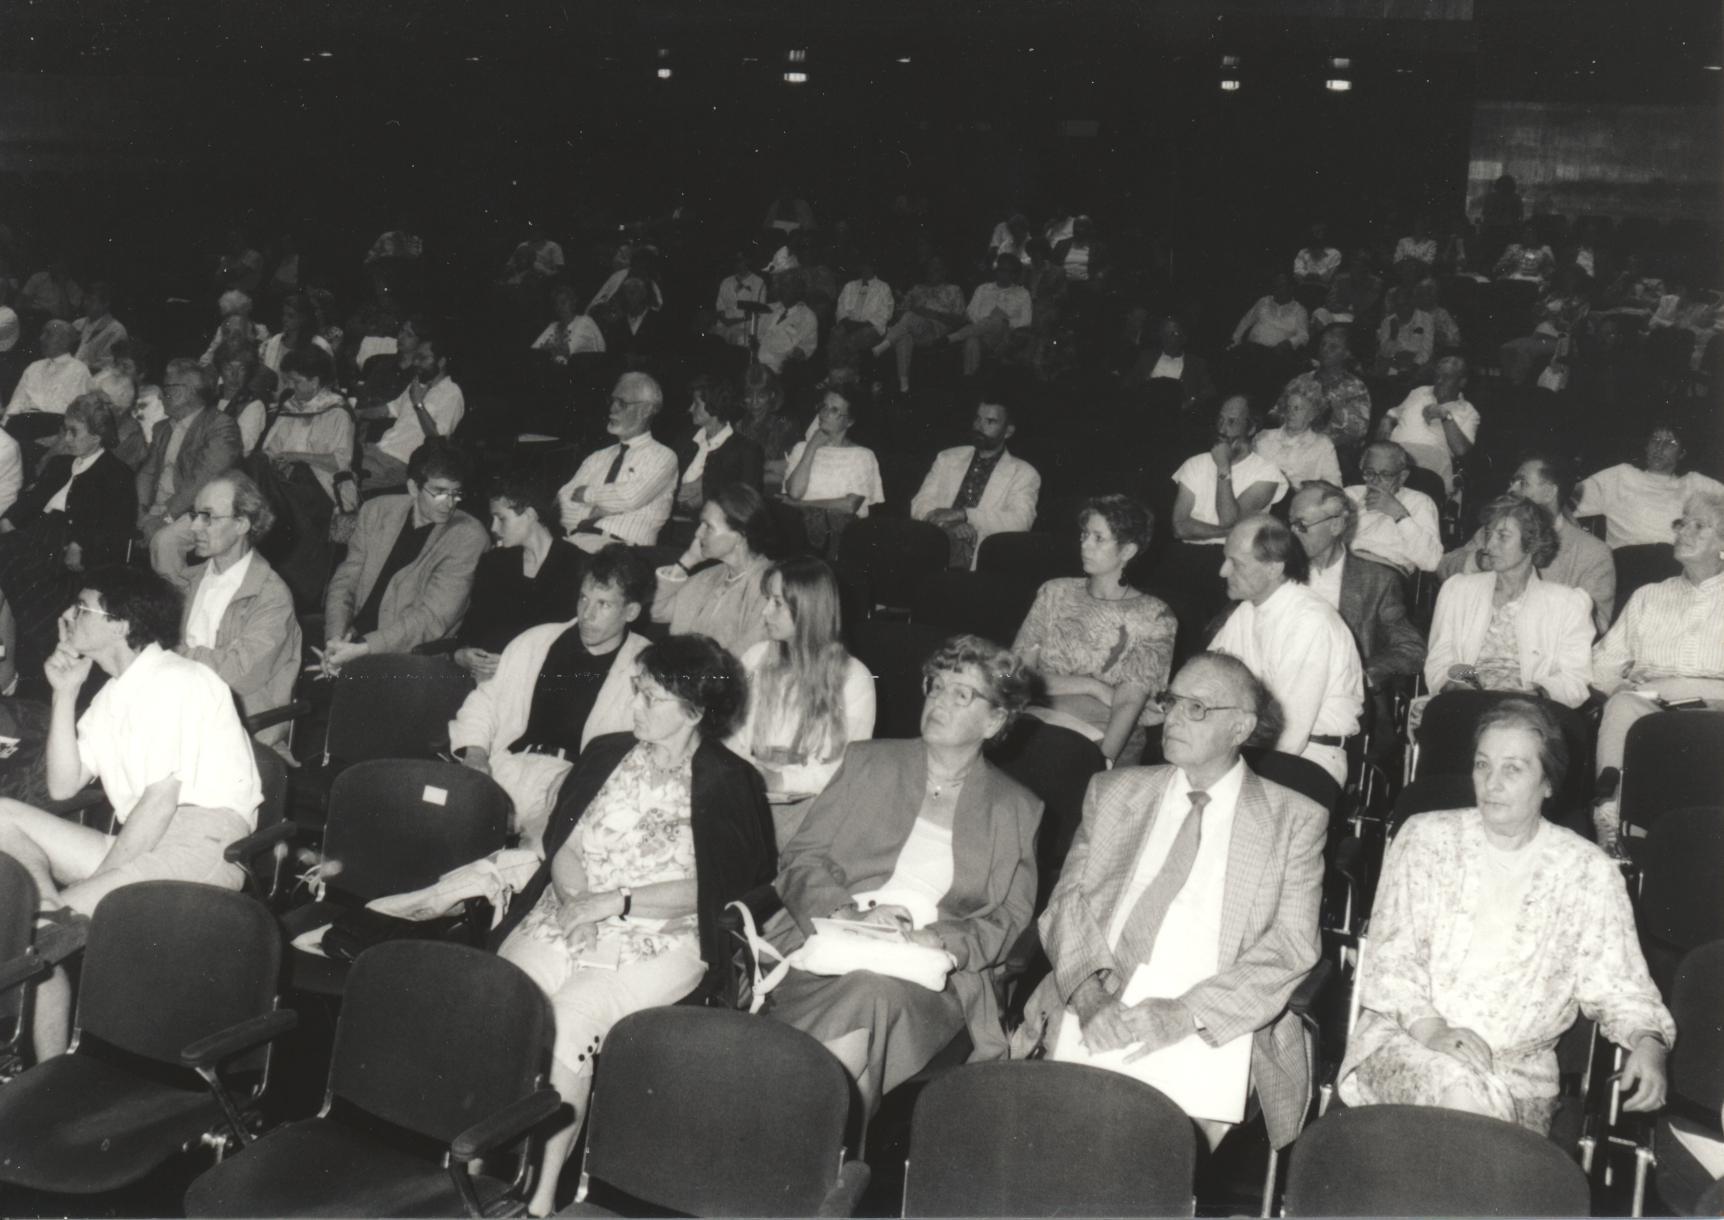 XIV. Imago Mundi-Kongress 1993, Innsbruck, Teilnehmerfoto